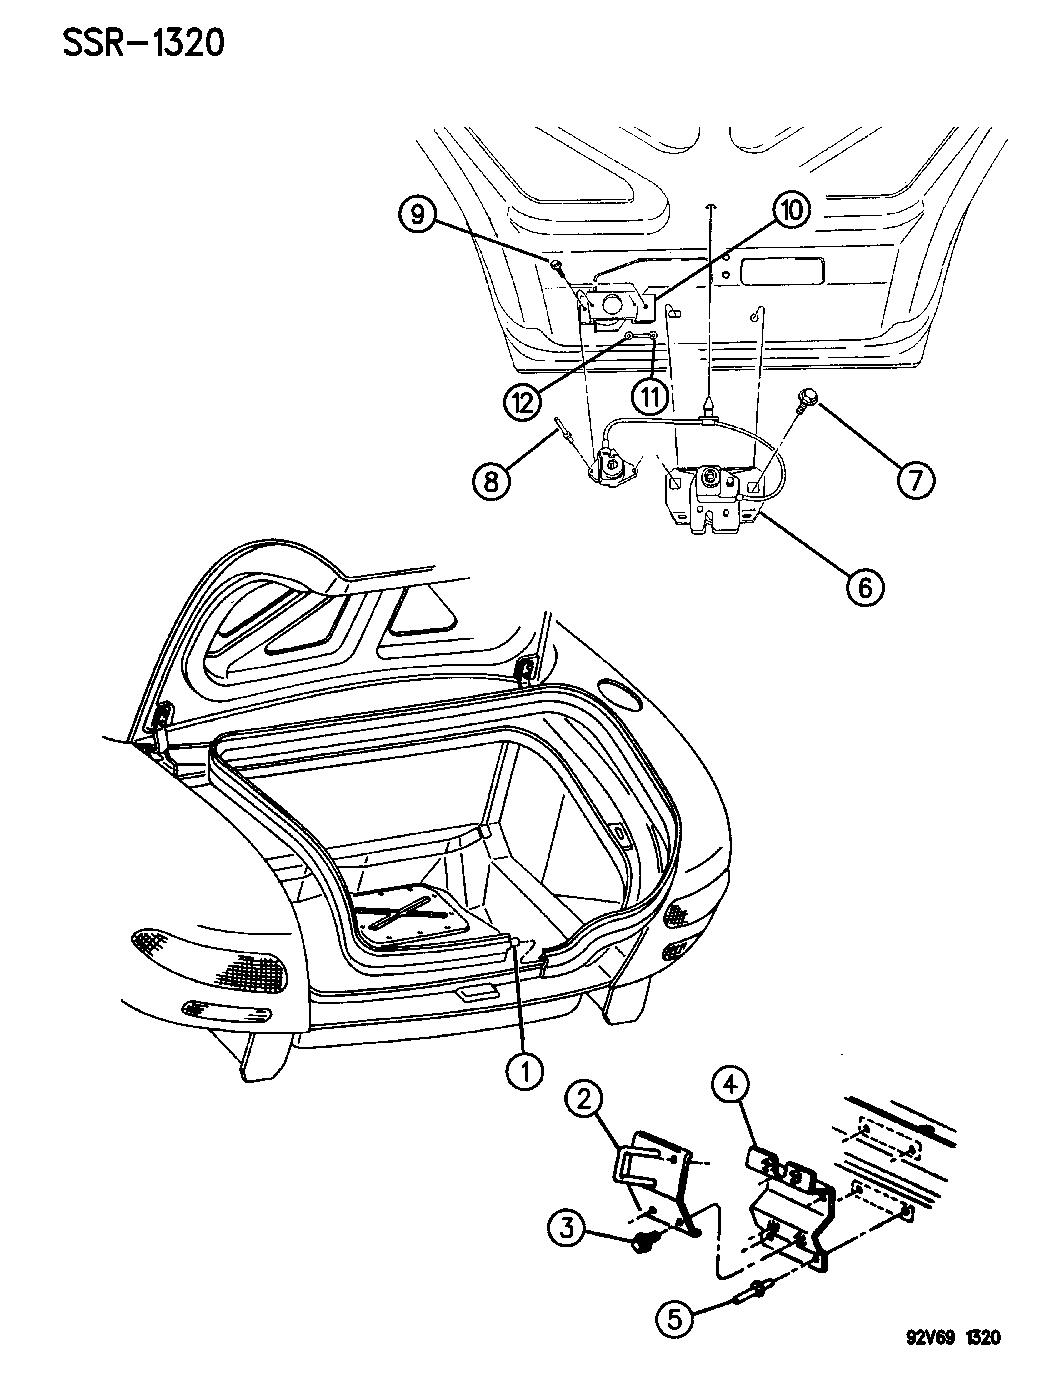 DIAGRAM] Wiring Diagram 1993 Dodge Viper FULL Version HD Quality Dodge Viper  - MEDIAGRAMM.CLUB-RONSARD.FRClub Ronsard